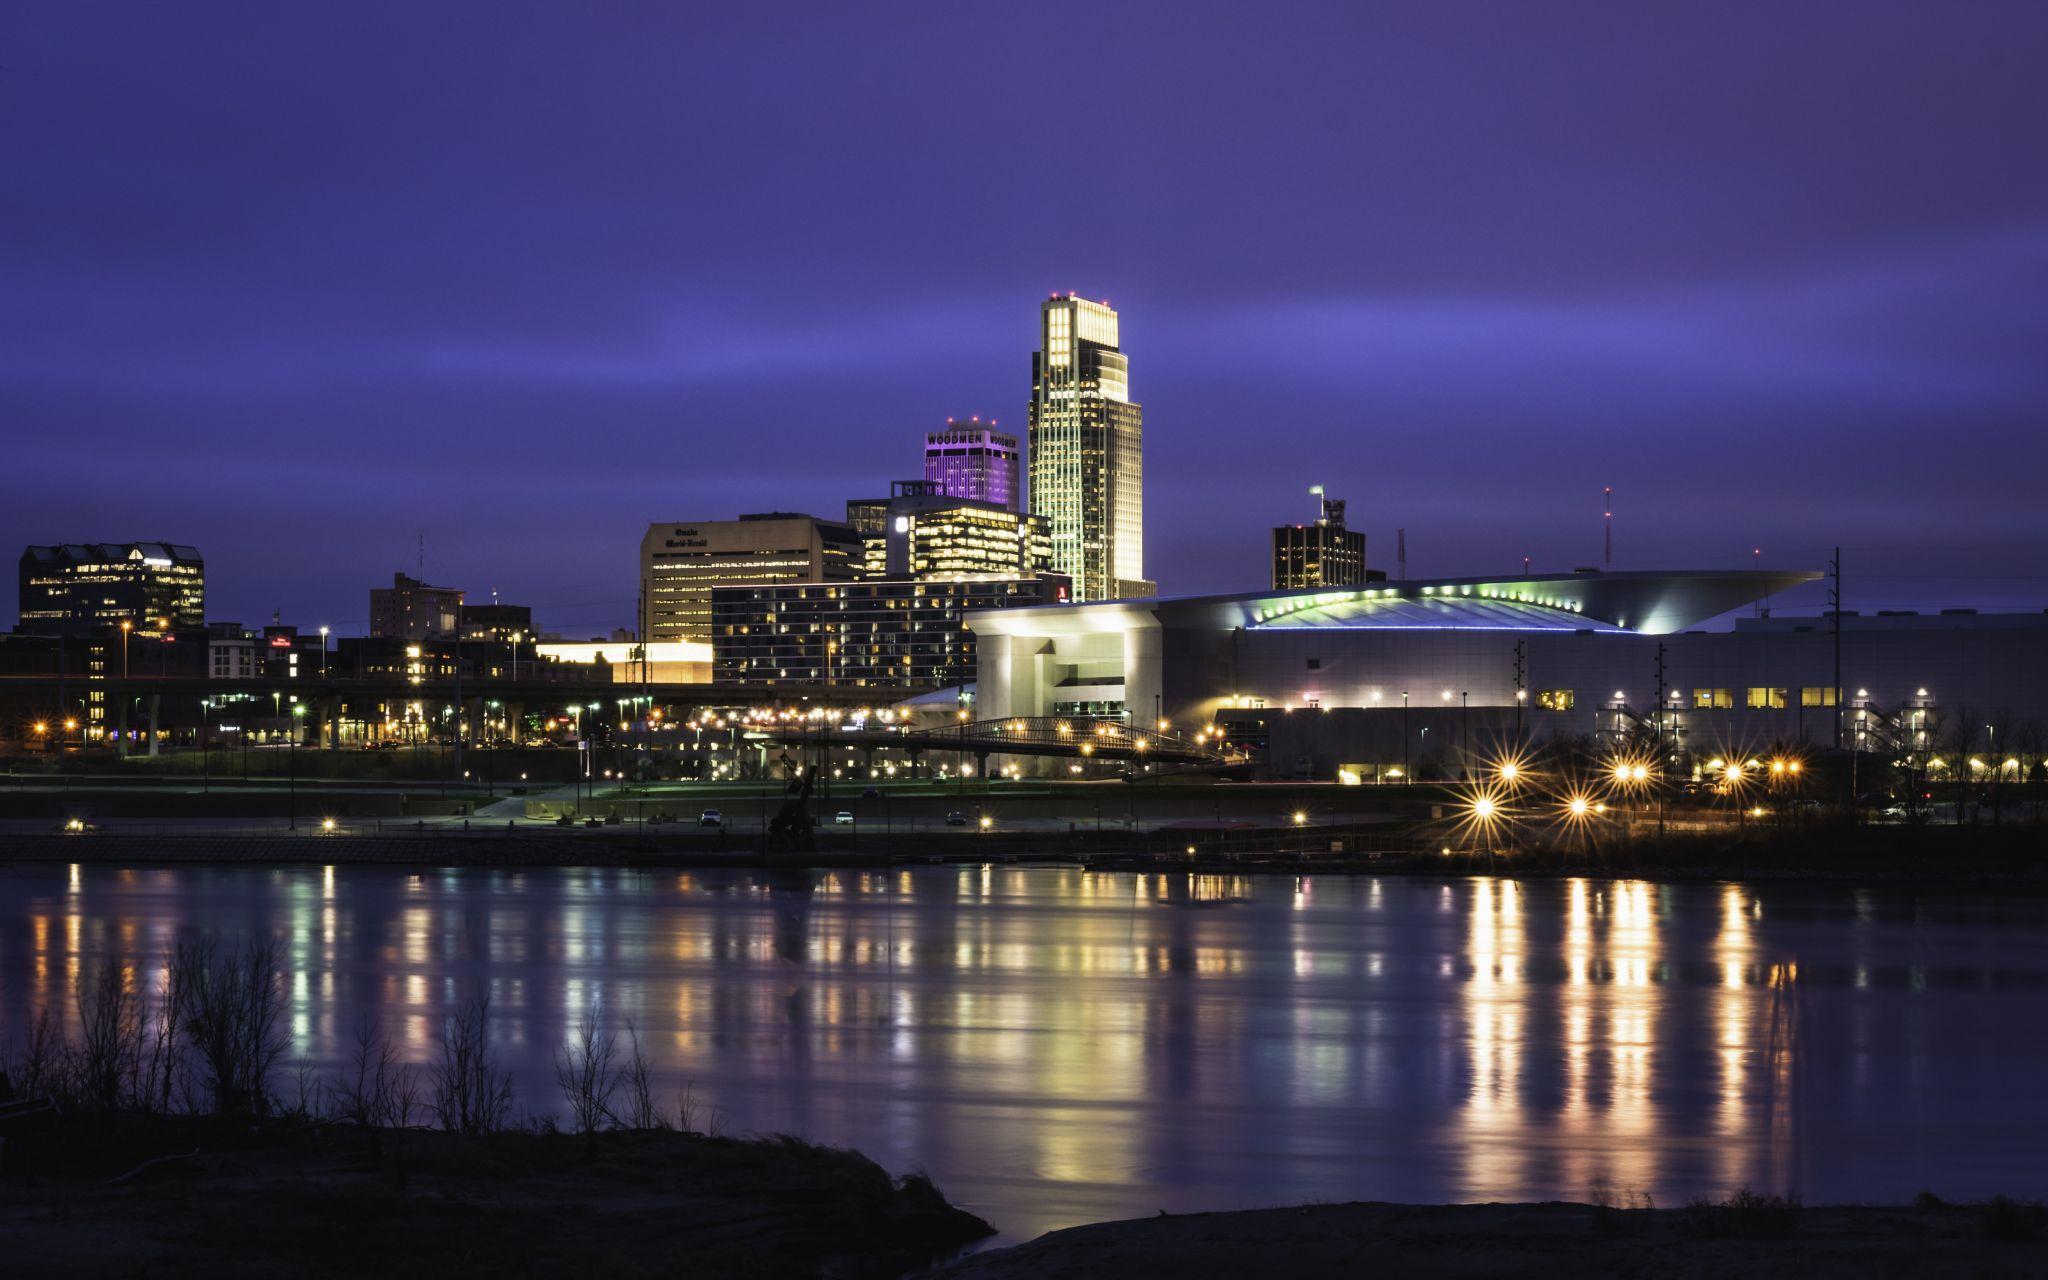 Omaha City Overlook, USA